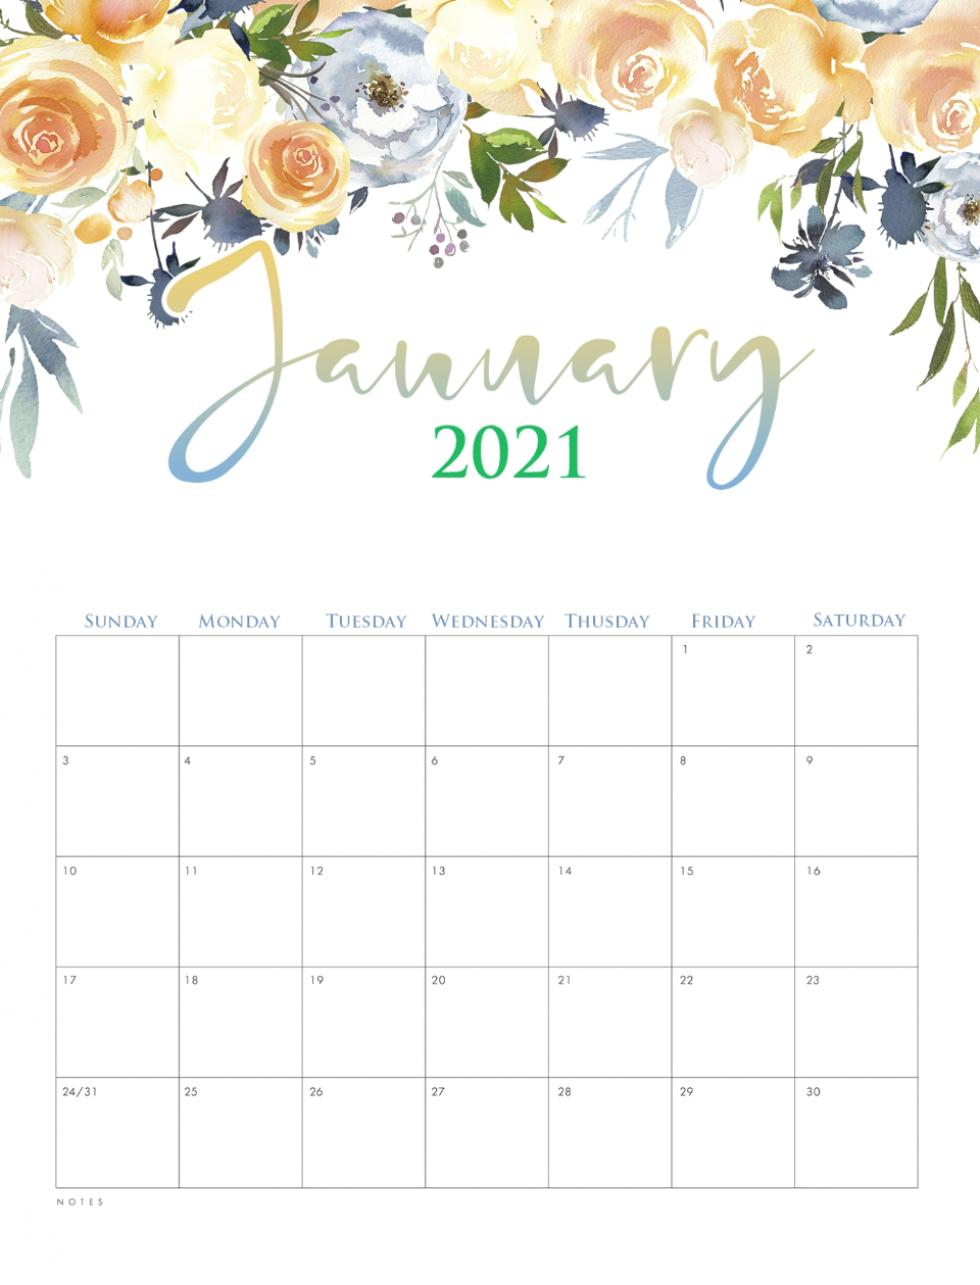 January Printable Calendar 2021 Cute Planner Monthly | Etsy